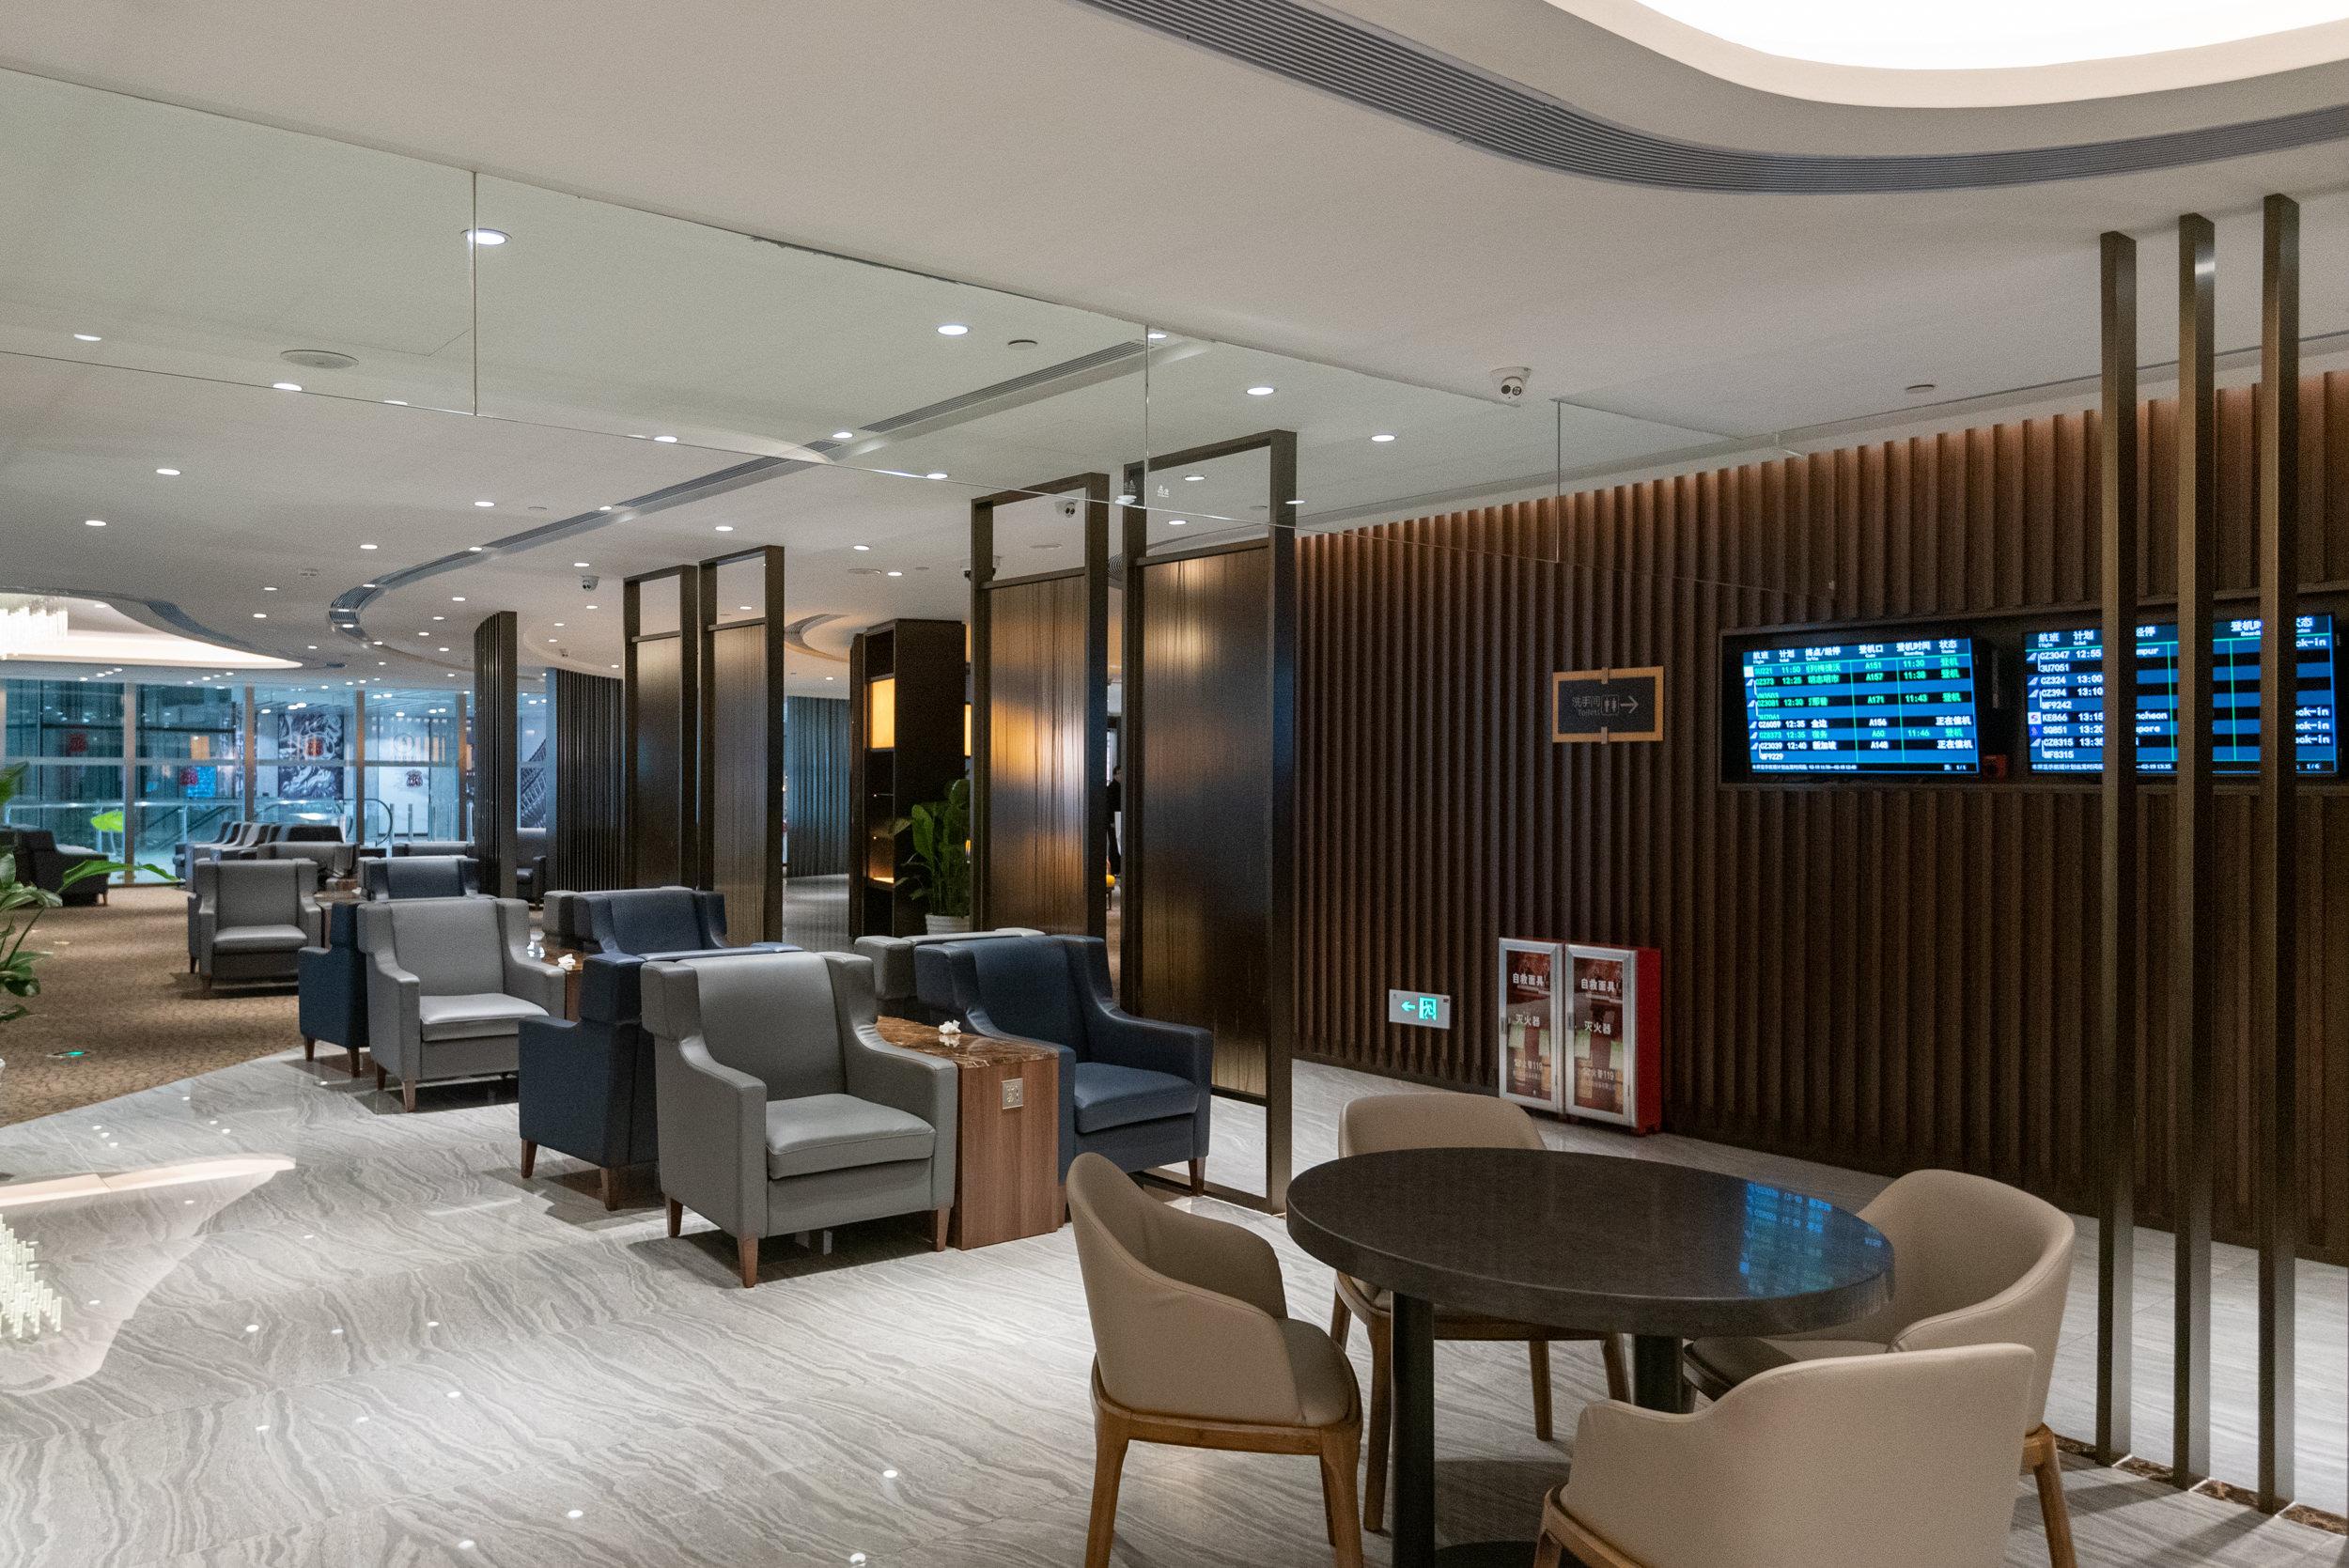 Plenty of Seats  Premium Lounge (Terminal 2) - Guangzhou Baiyun International Airport (CAN)